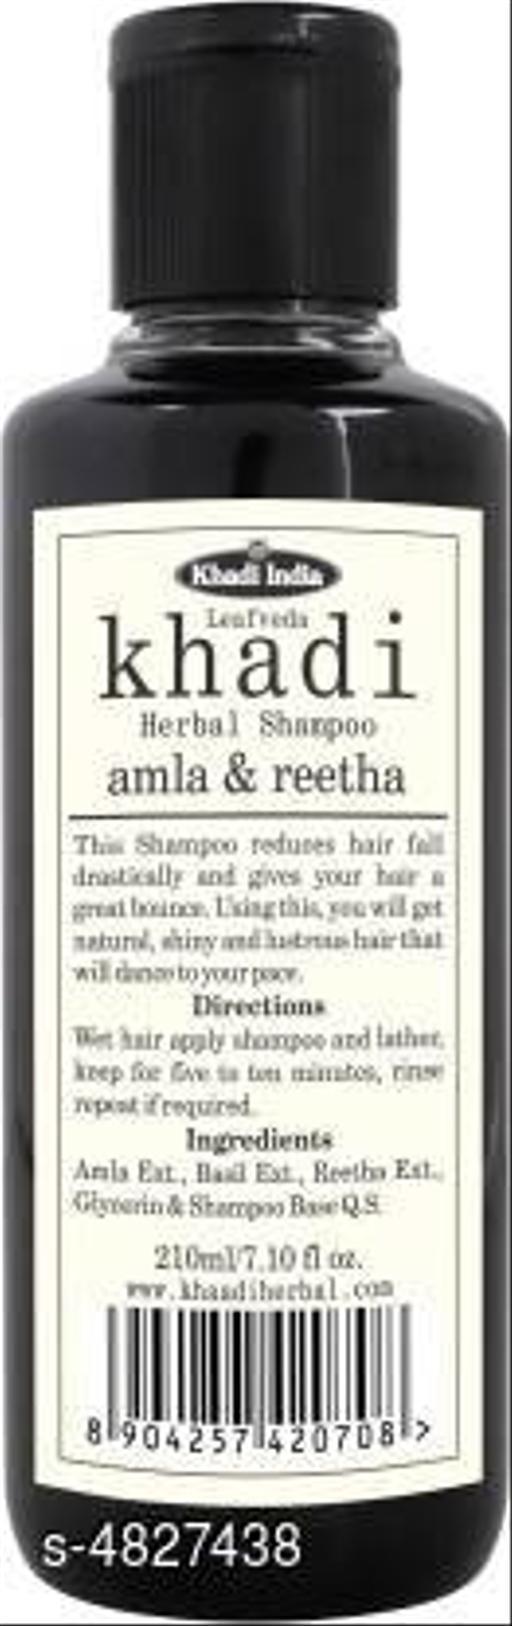 Hair Care Leafveda Khadi Amla & Reetha Shampoo (210 ml)  *Product Name* Leafveda Khadi Amla & Reetha Shampoo (210 ml)  *Multipack* 2  *Type* Hair Cleanser  *Capacity* 210 ml Each  *Sizes Available* Free Size *   Catalog Rating: ★4.4 (5)  Catalog Name: Advanced Nourshing Shampoo CatalogID_704204 C50-SC1249 Code: 431-4827438-